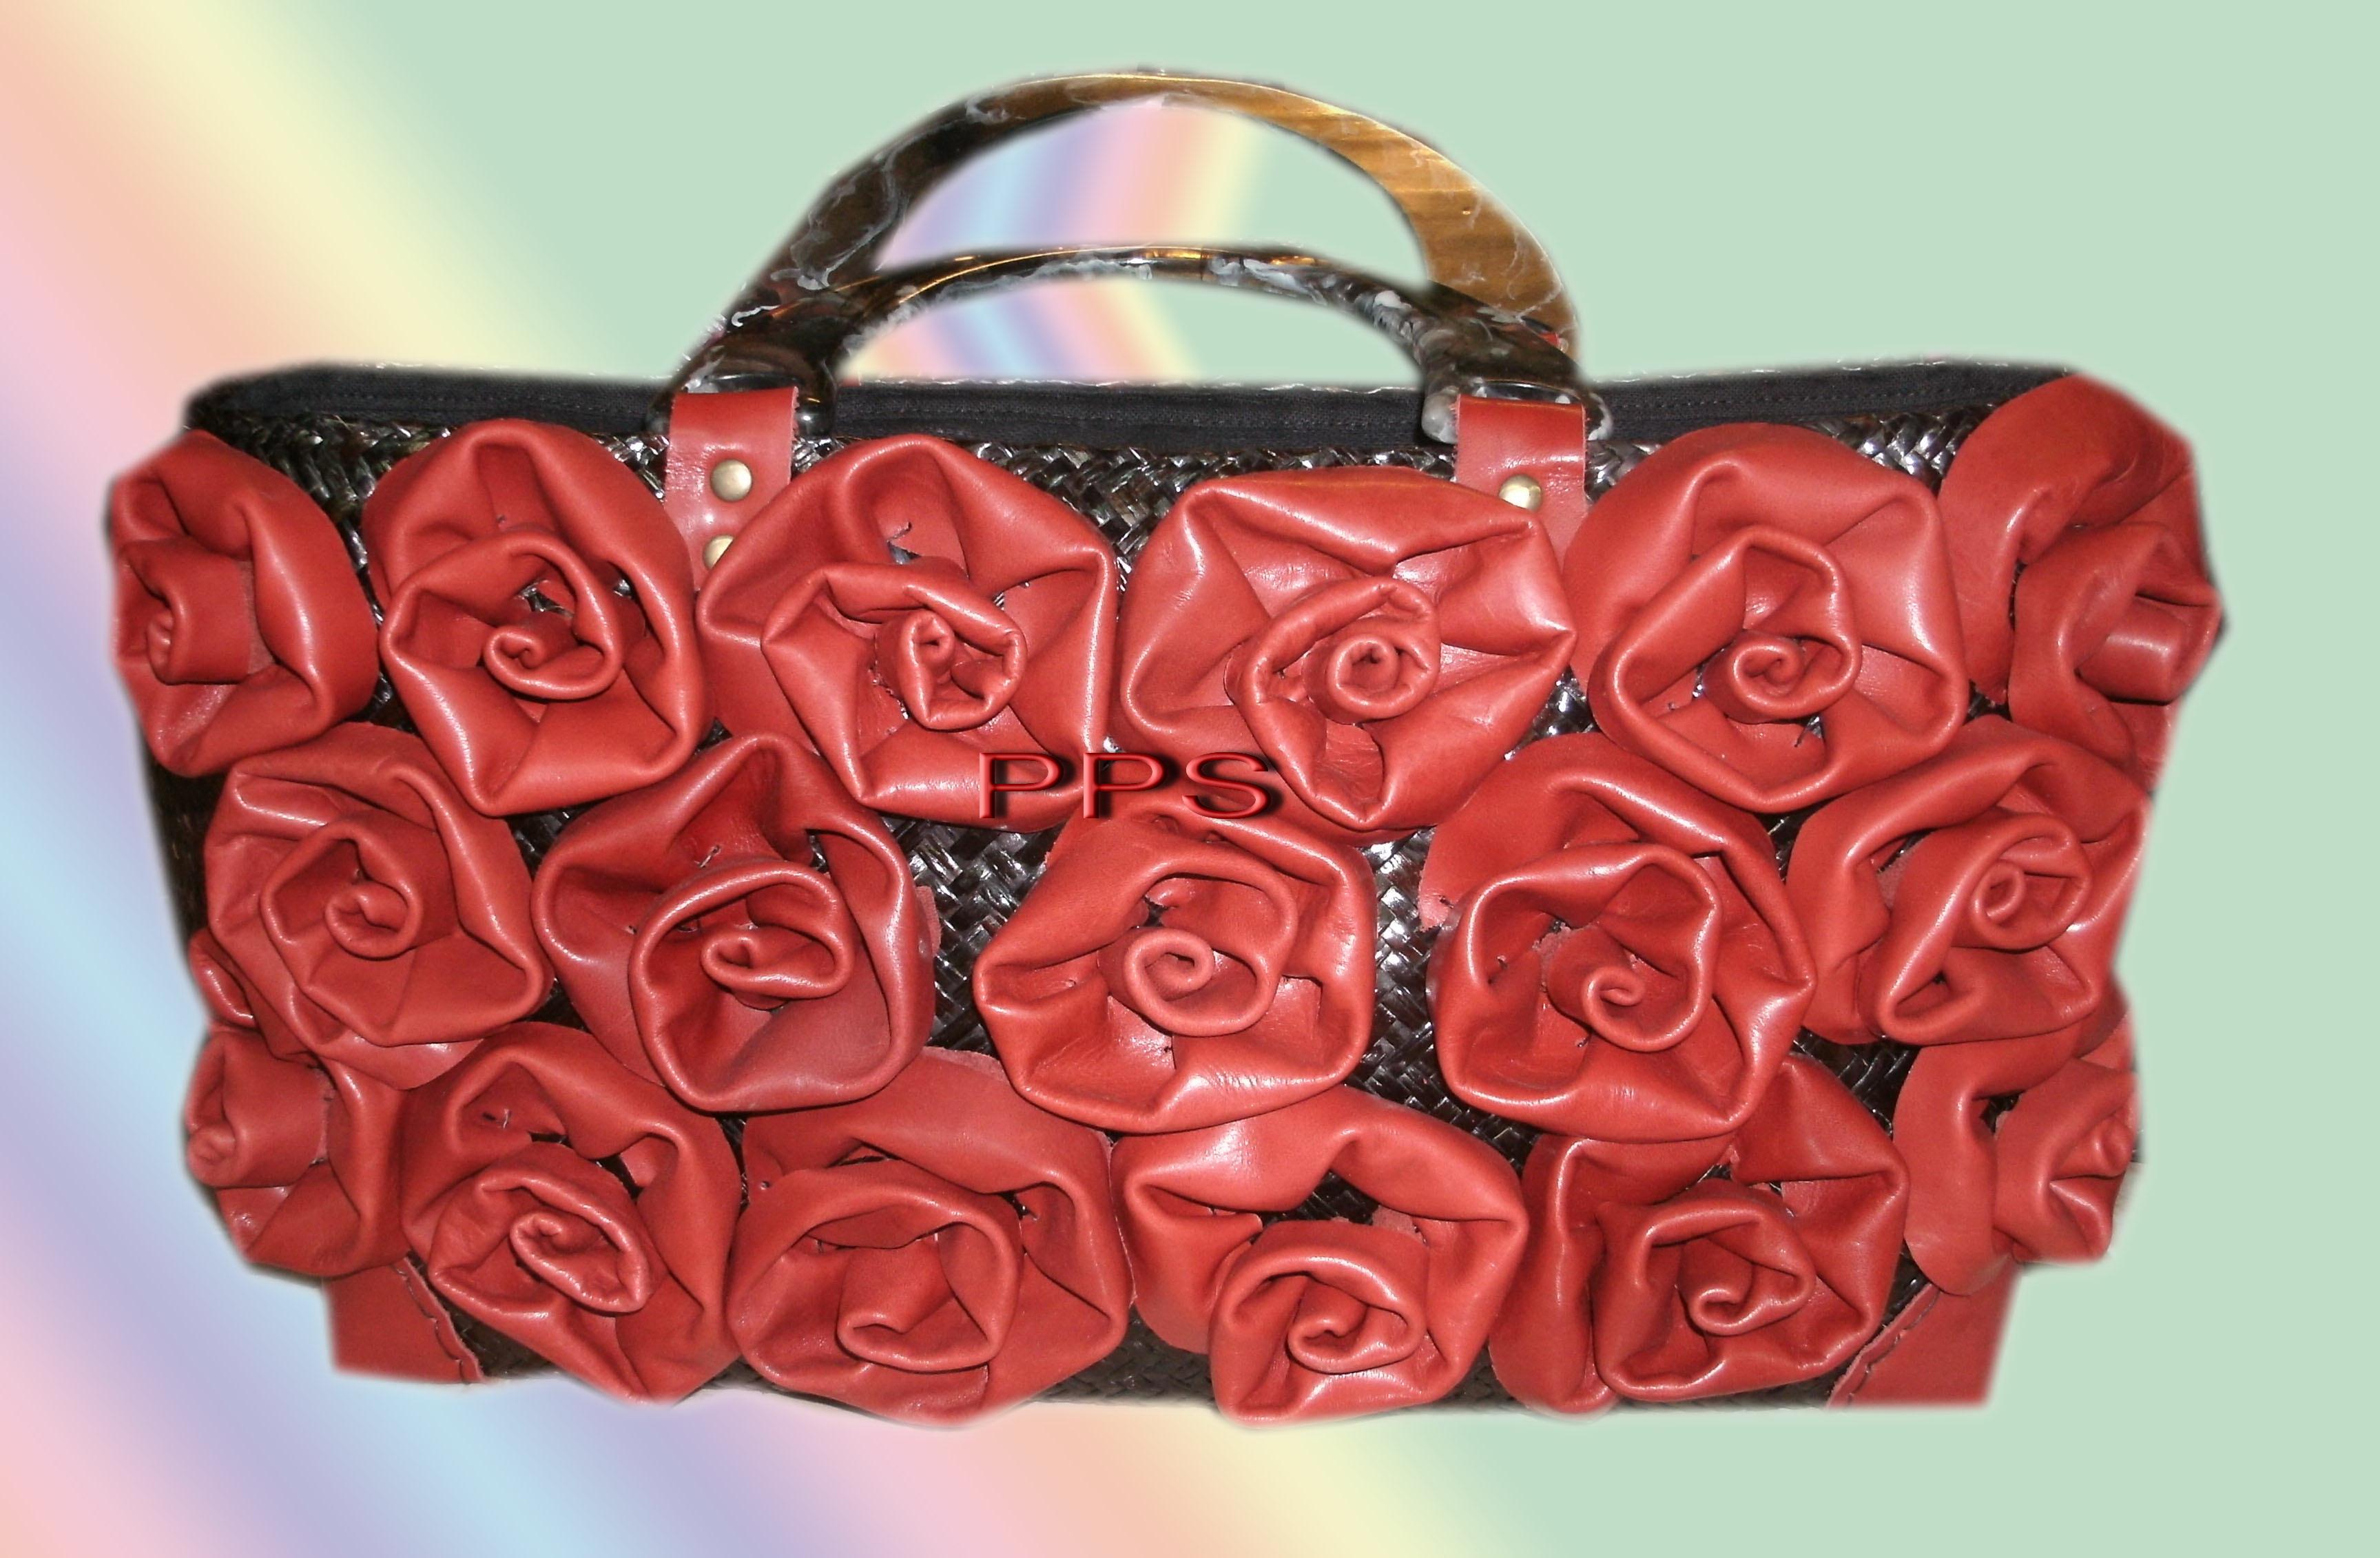 Seagrass and PU-Bag-PPS bag brand